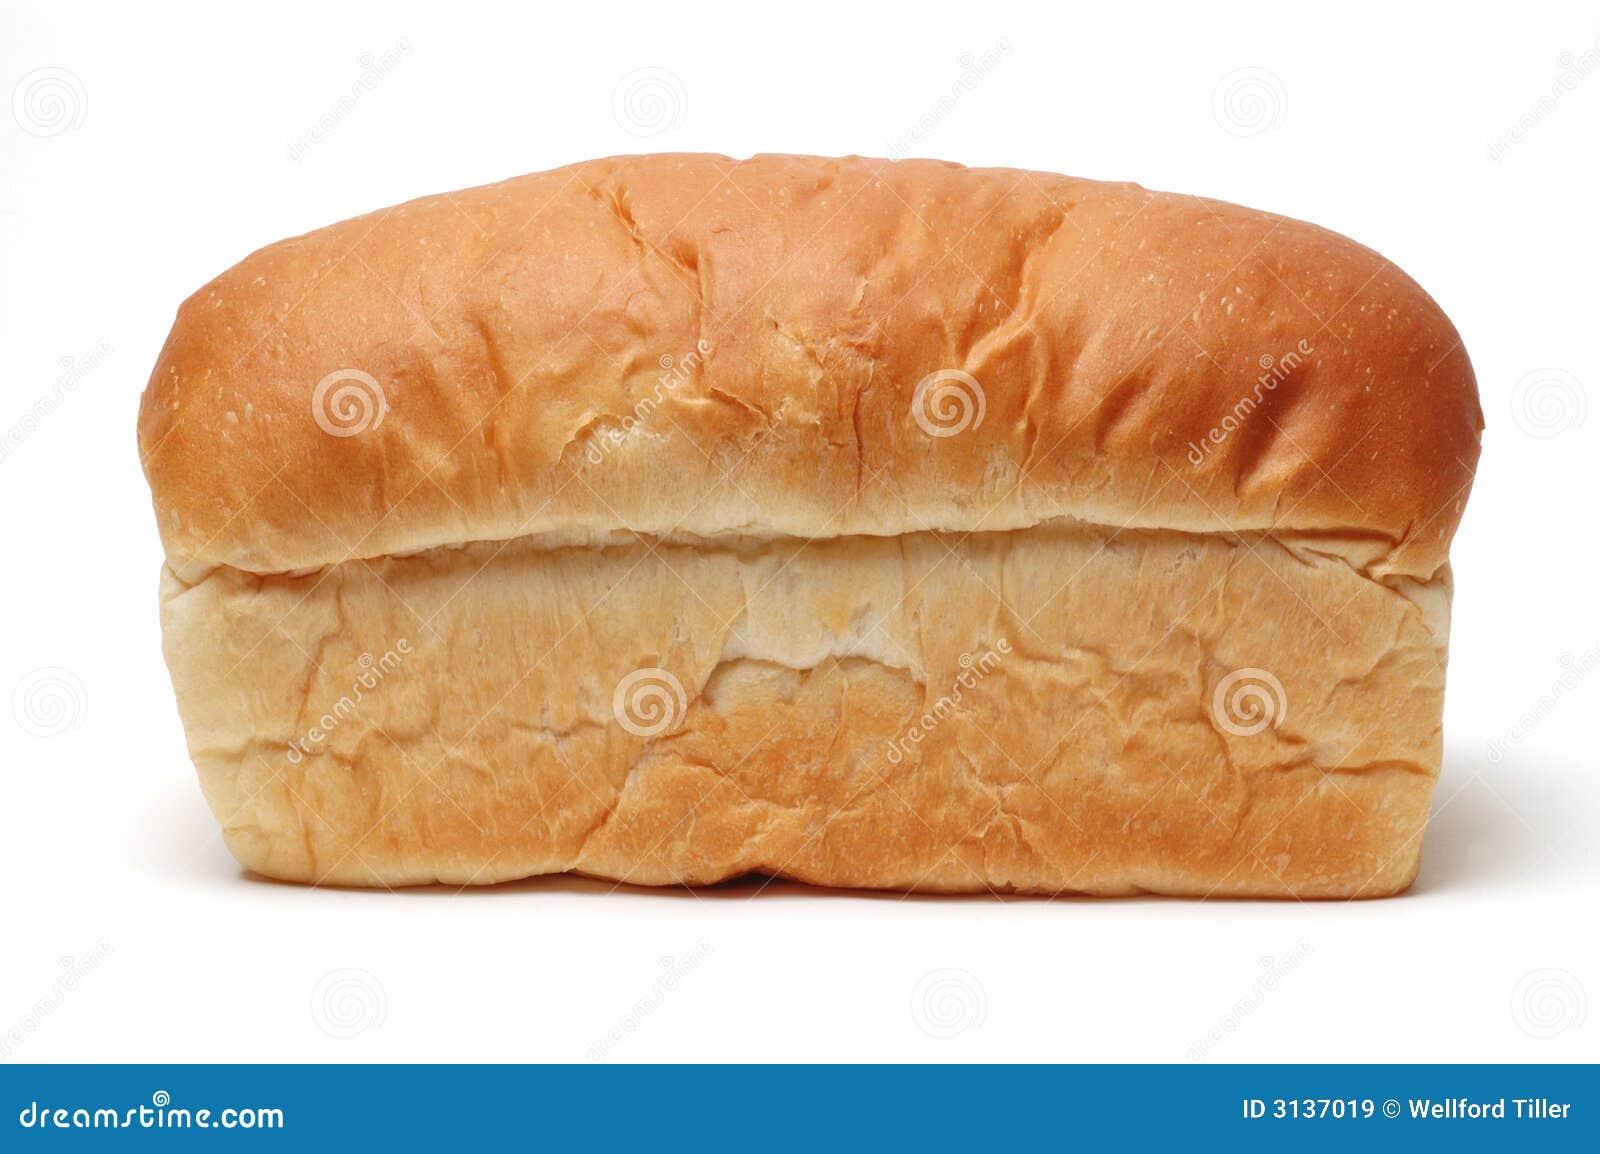 Sainsbury bread